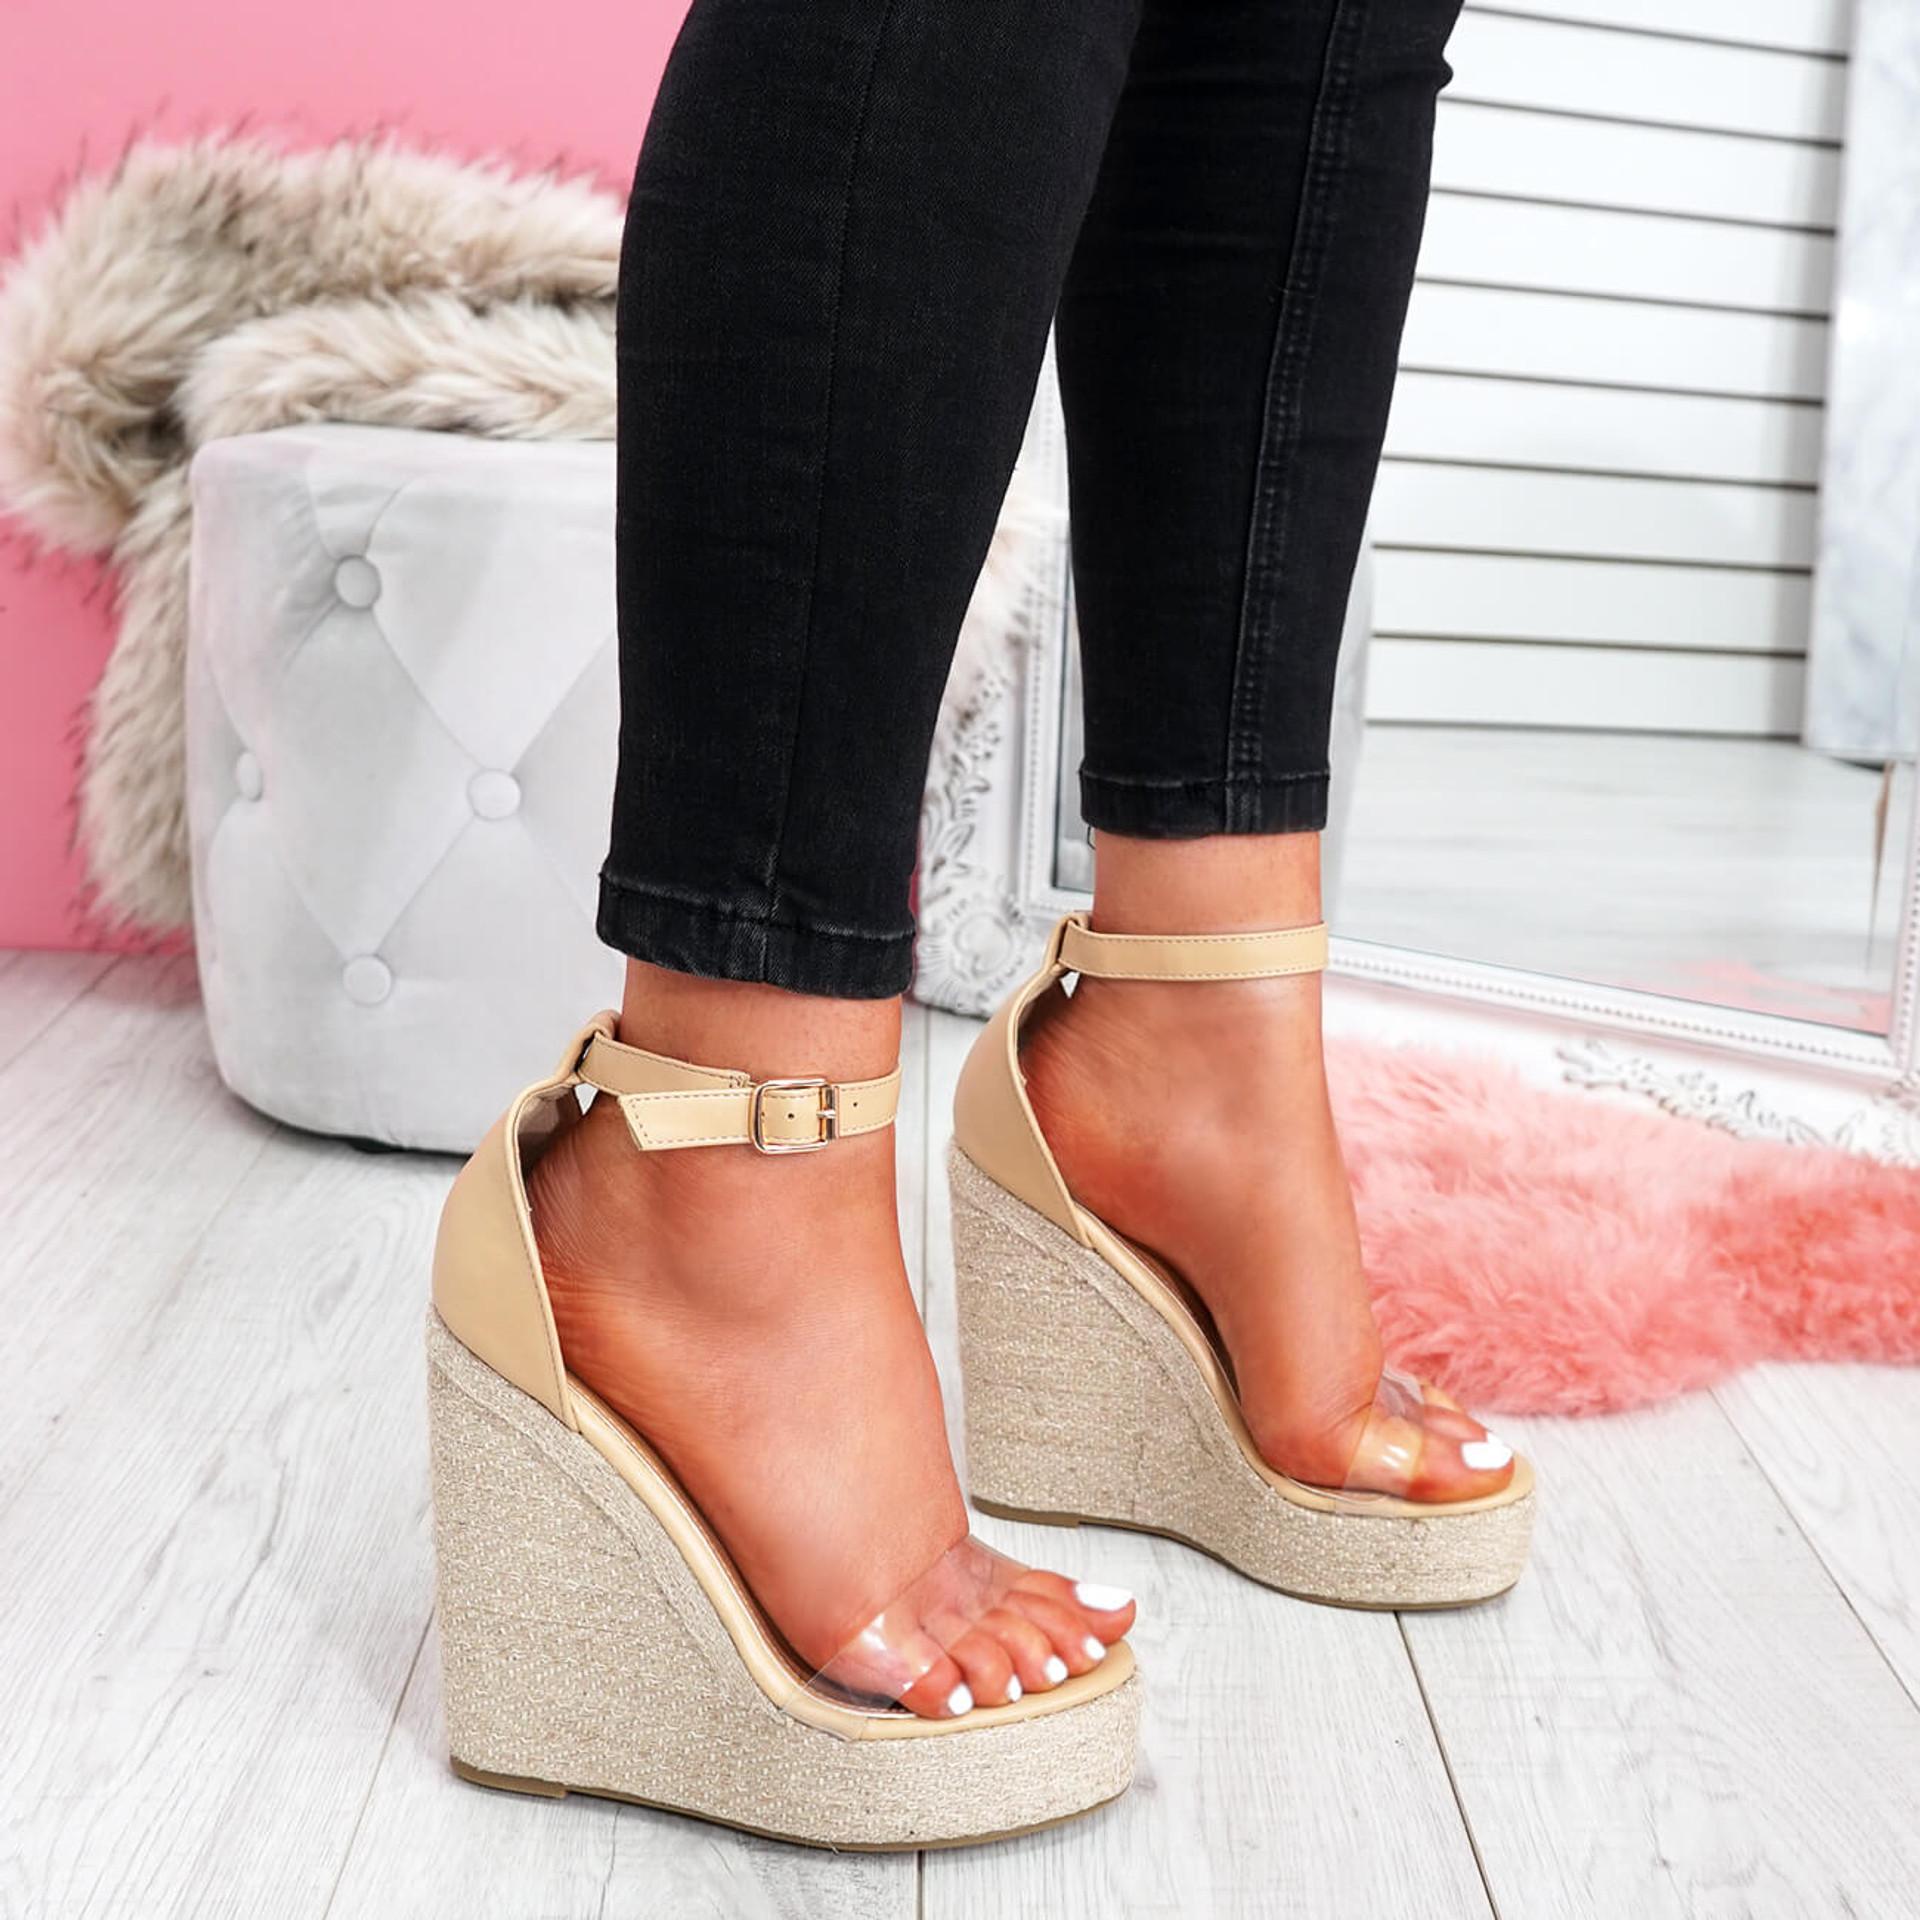 UK Womens Ladies Wedge Espadrille Slingback Sandals Platform Peep Toe Shoes Size